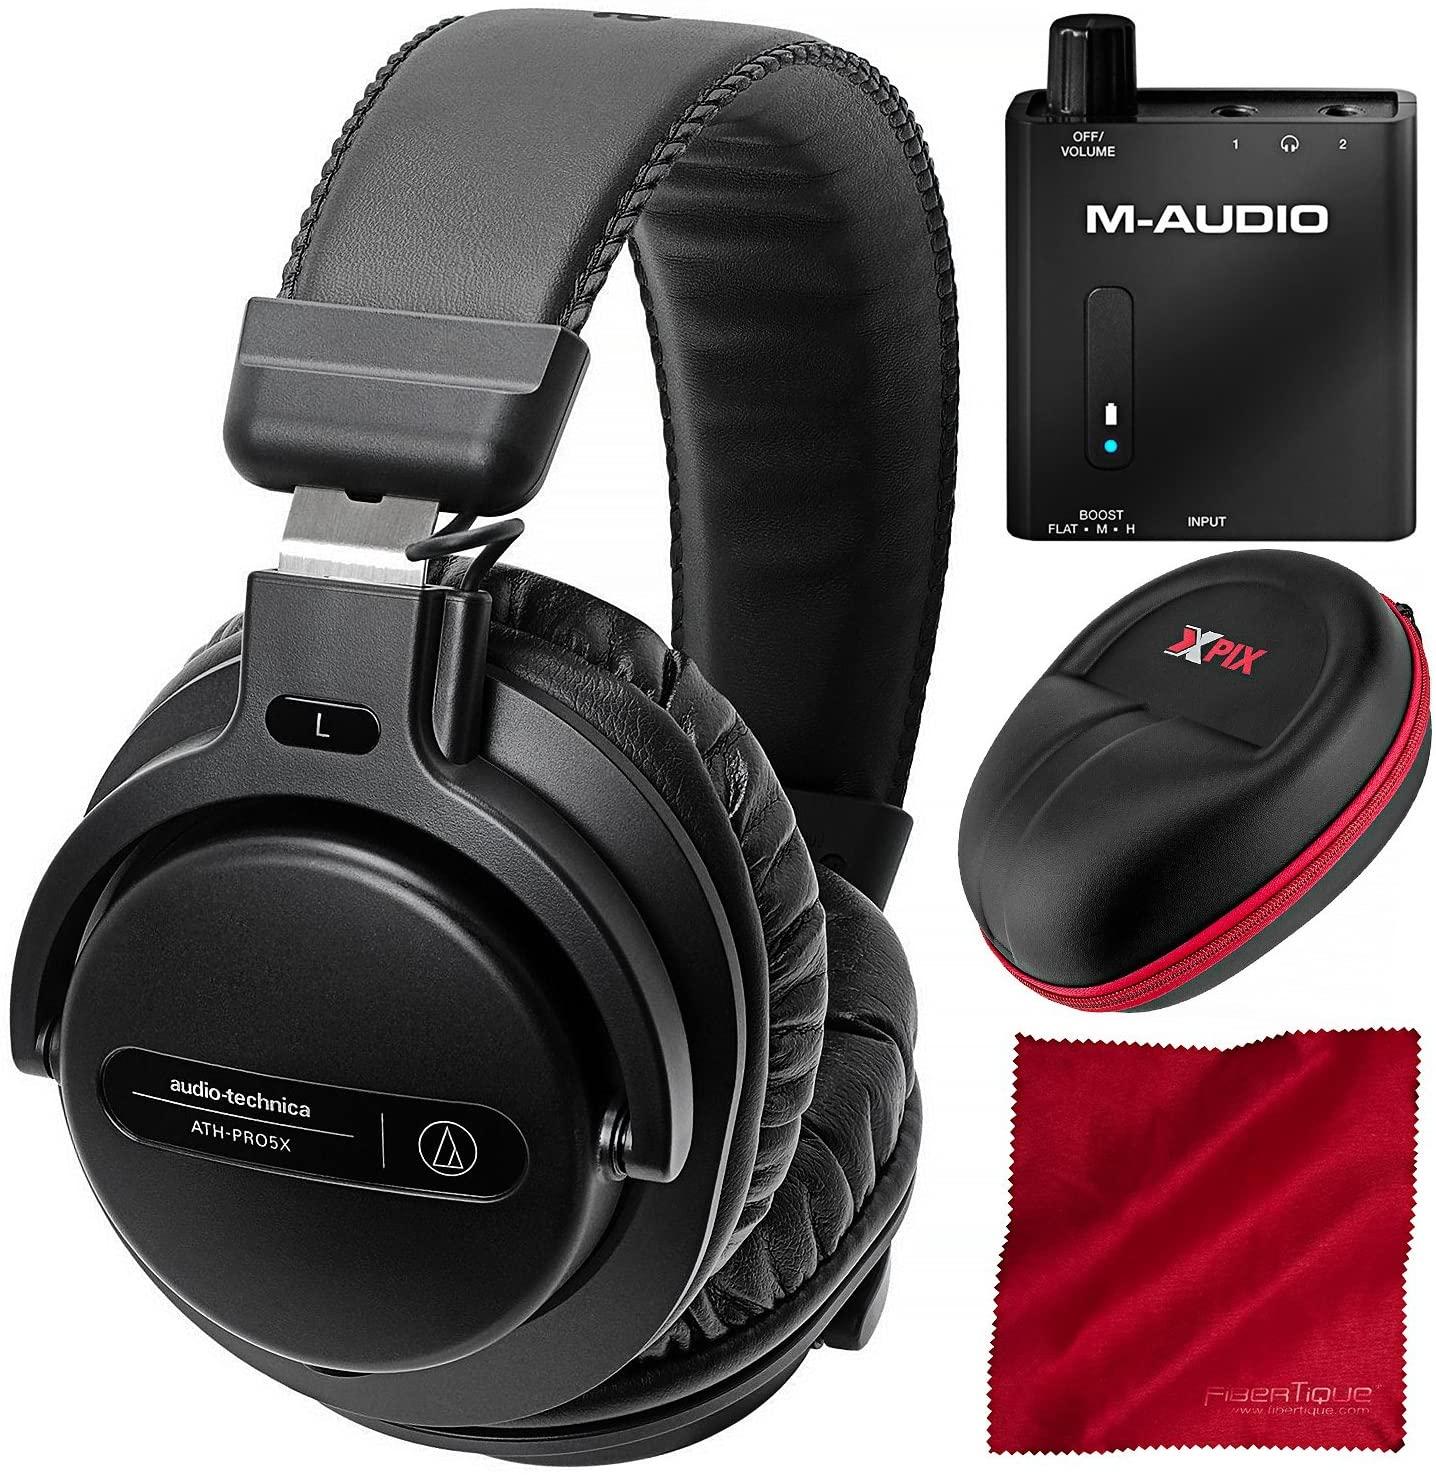 Audio-Technica ATH-PRO5XBK Professional On-Ear DJ Monitor Headphones with M-Audio Bass Traveler Headphone Amplifier, Xpix Headphone Case, and Fibertique Cloth